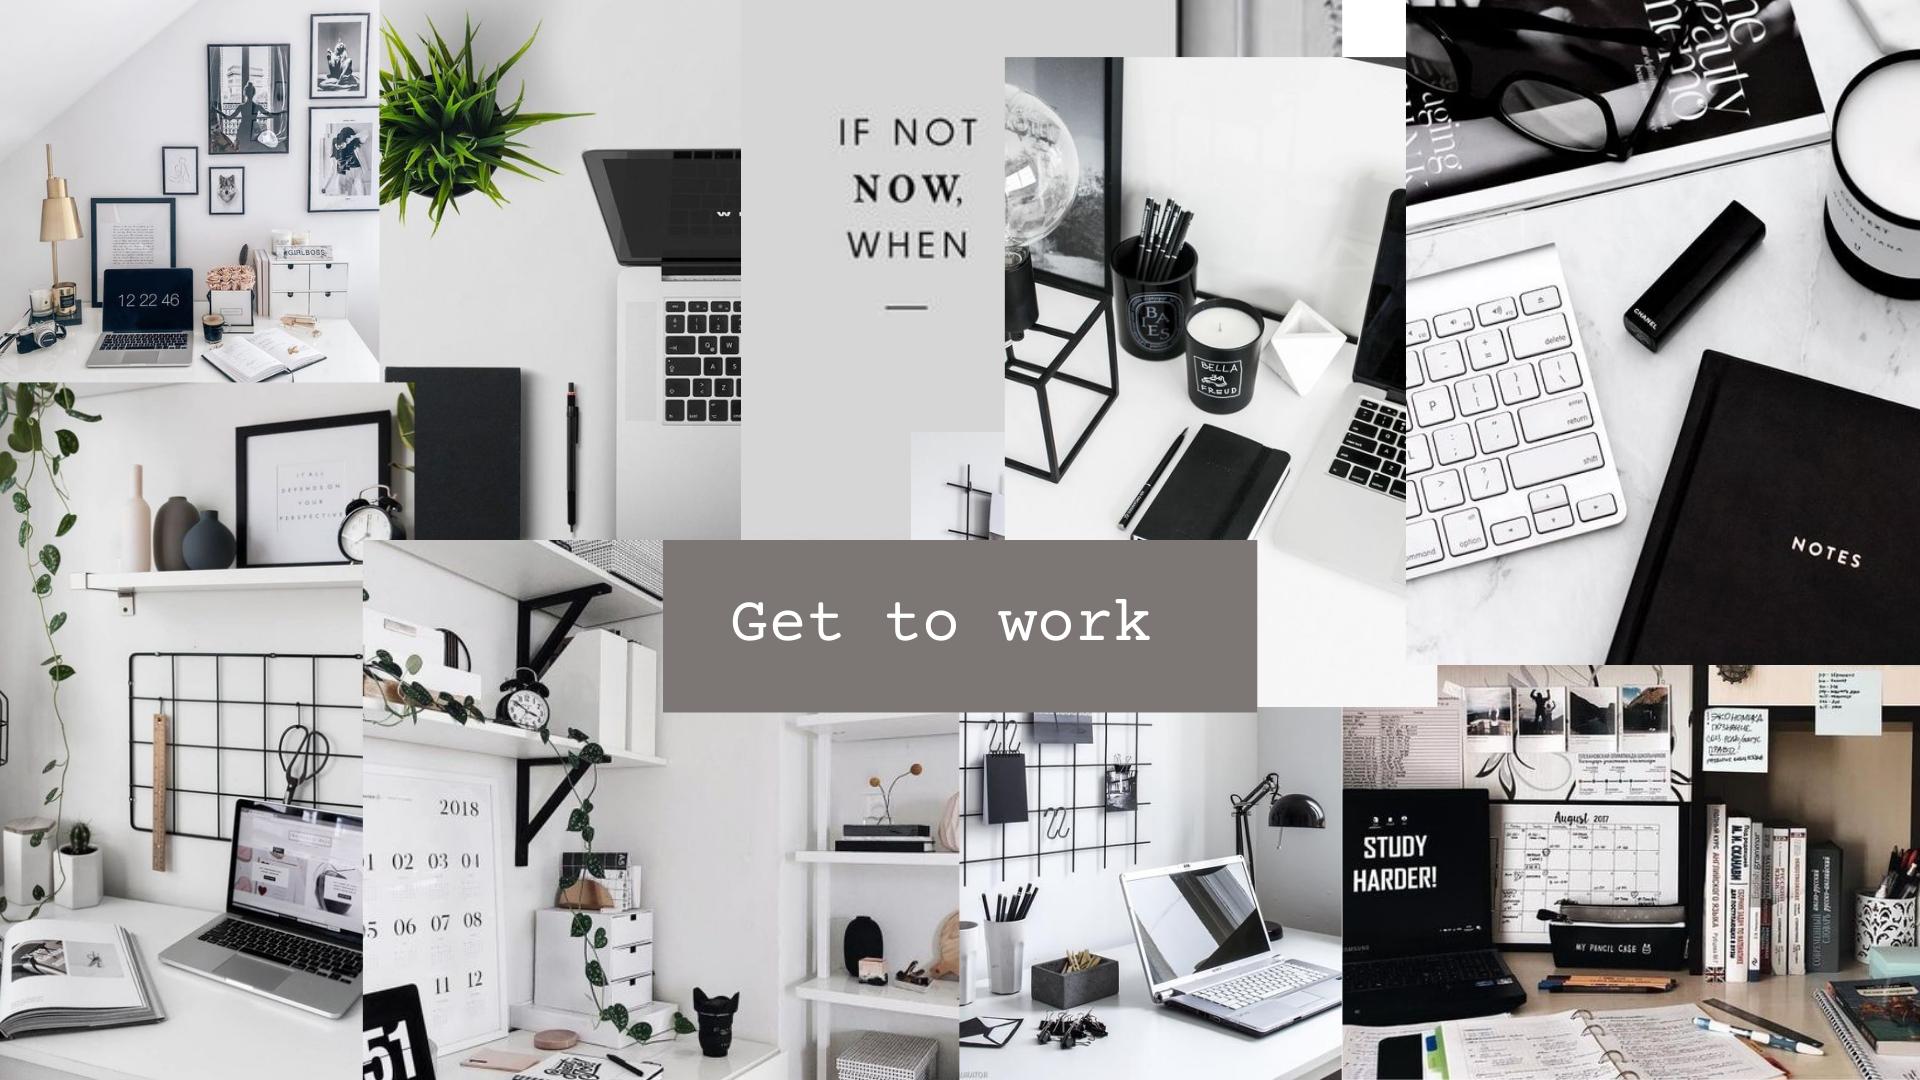 Productivity Wallpaper In 2021 Aesthetic Desktop Wallpaper Cute Laptop Wallpaper Desktop Wallpaper Organizer